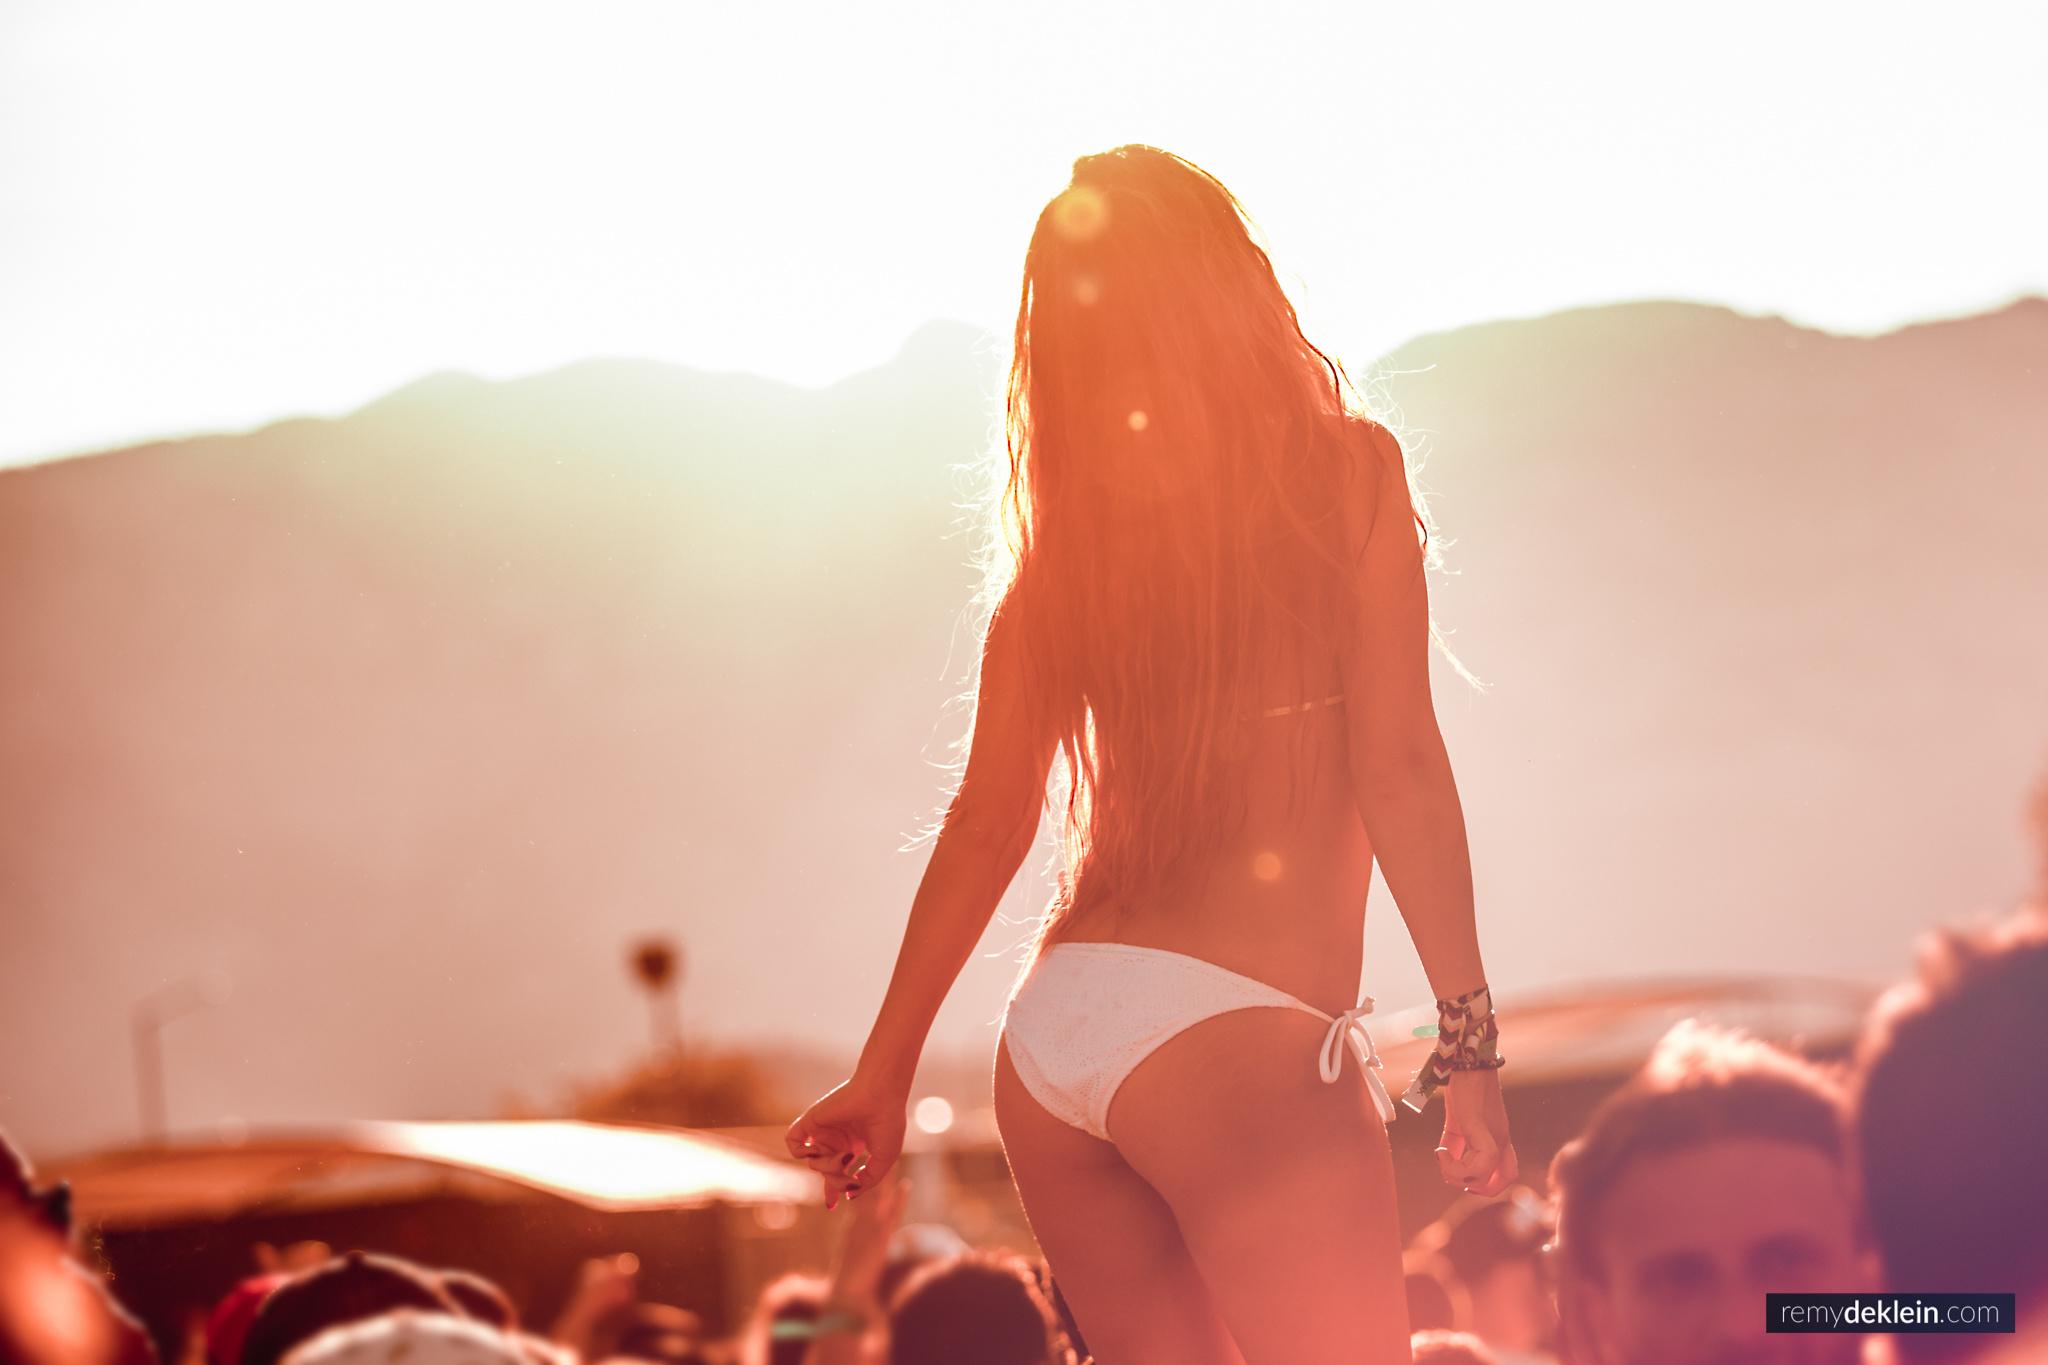 Sunset girl in Bikini